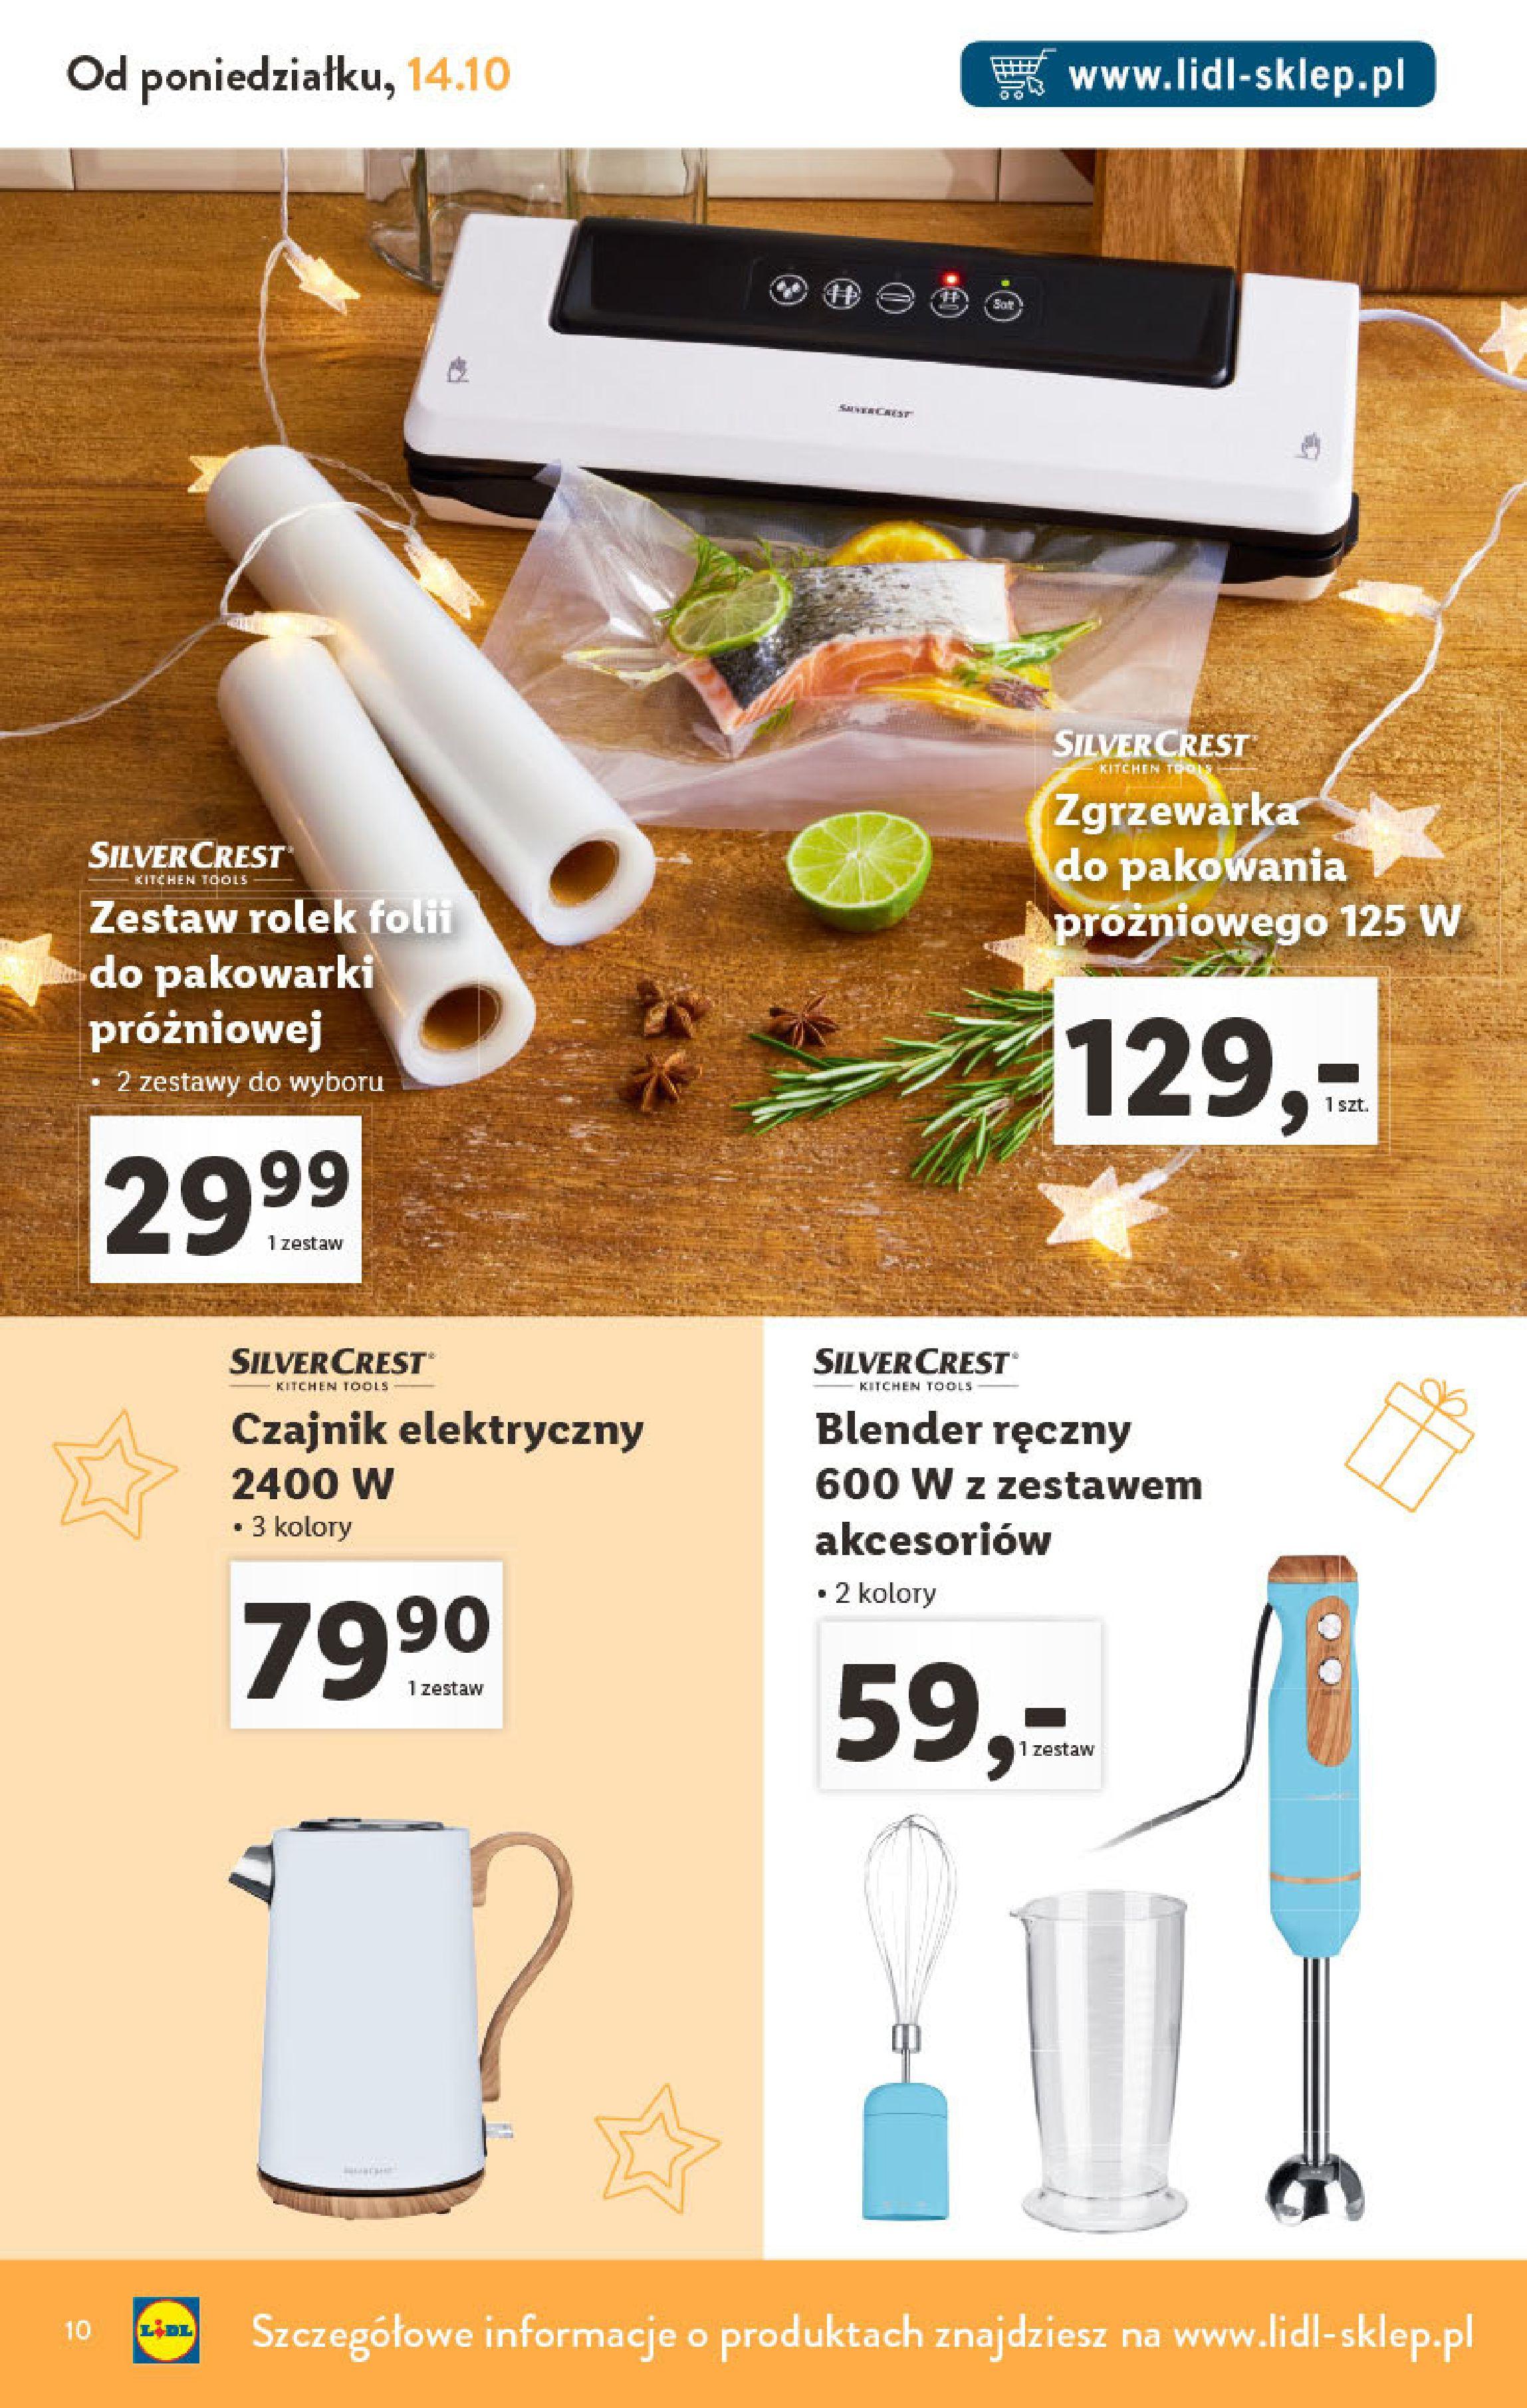 Gazetka Lidl - Katalog Online-13.10.2019-02.12.2019-page-10